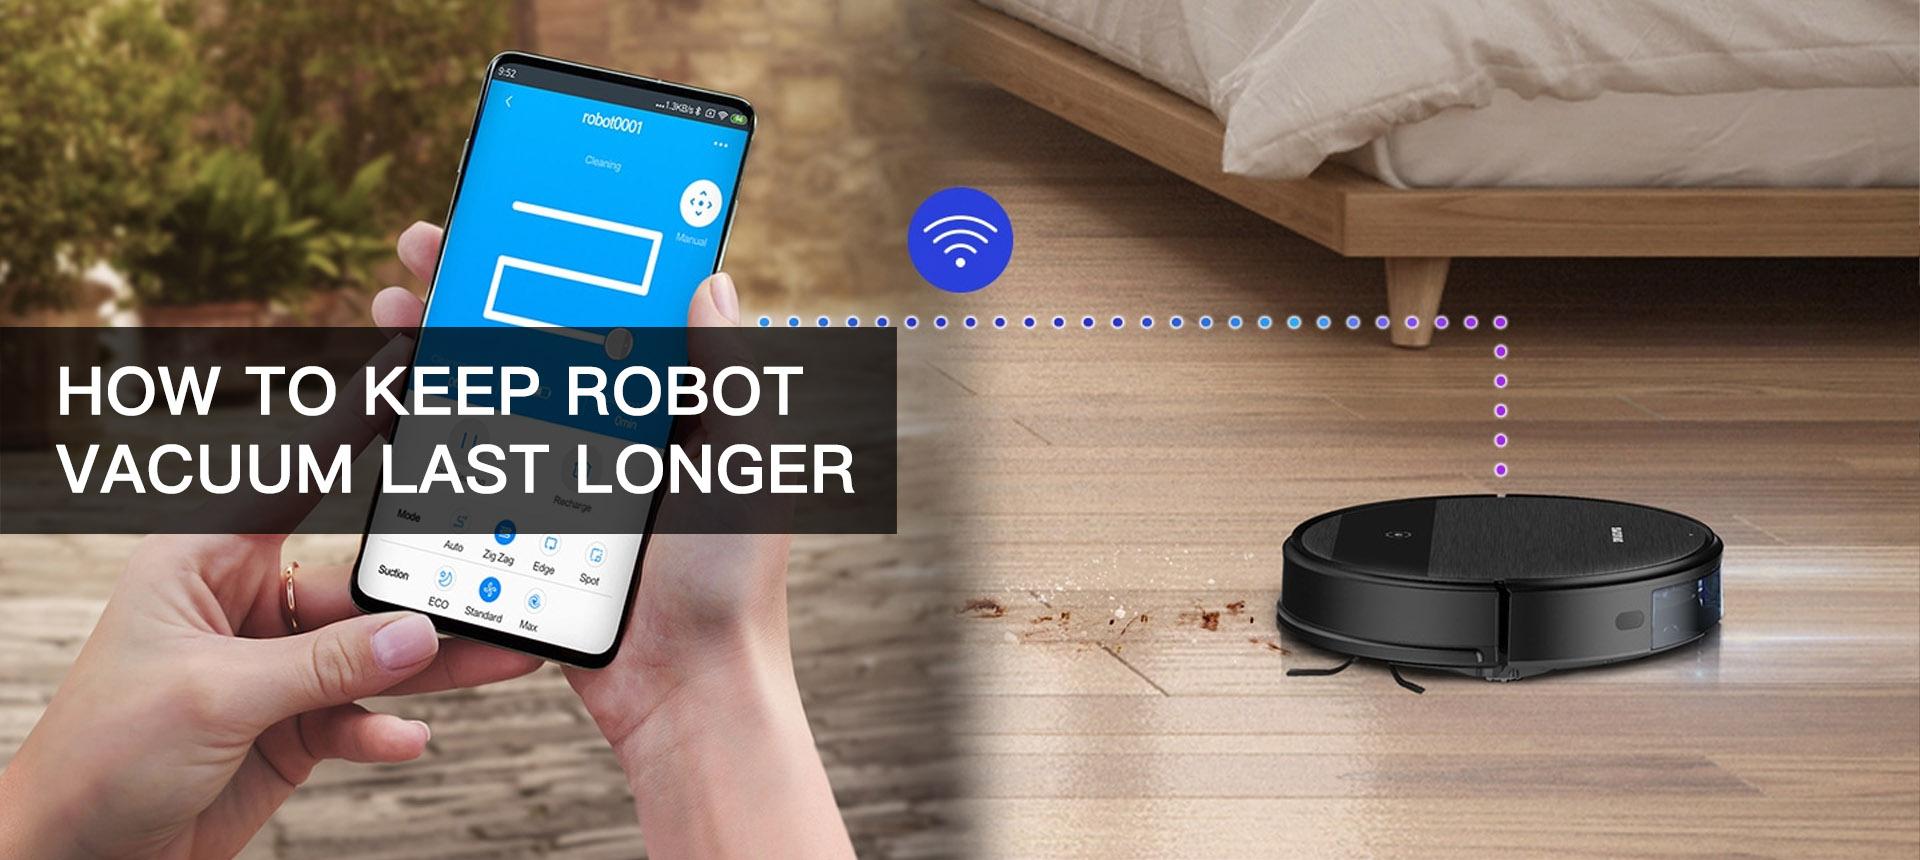 How To Keep Robot Vacuum Last Longer